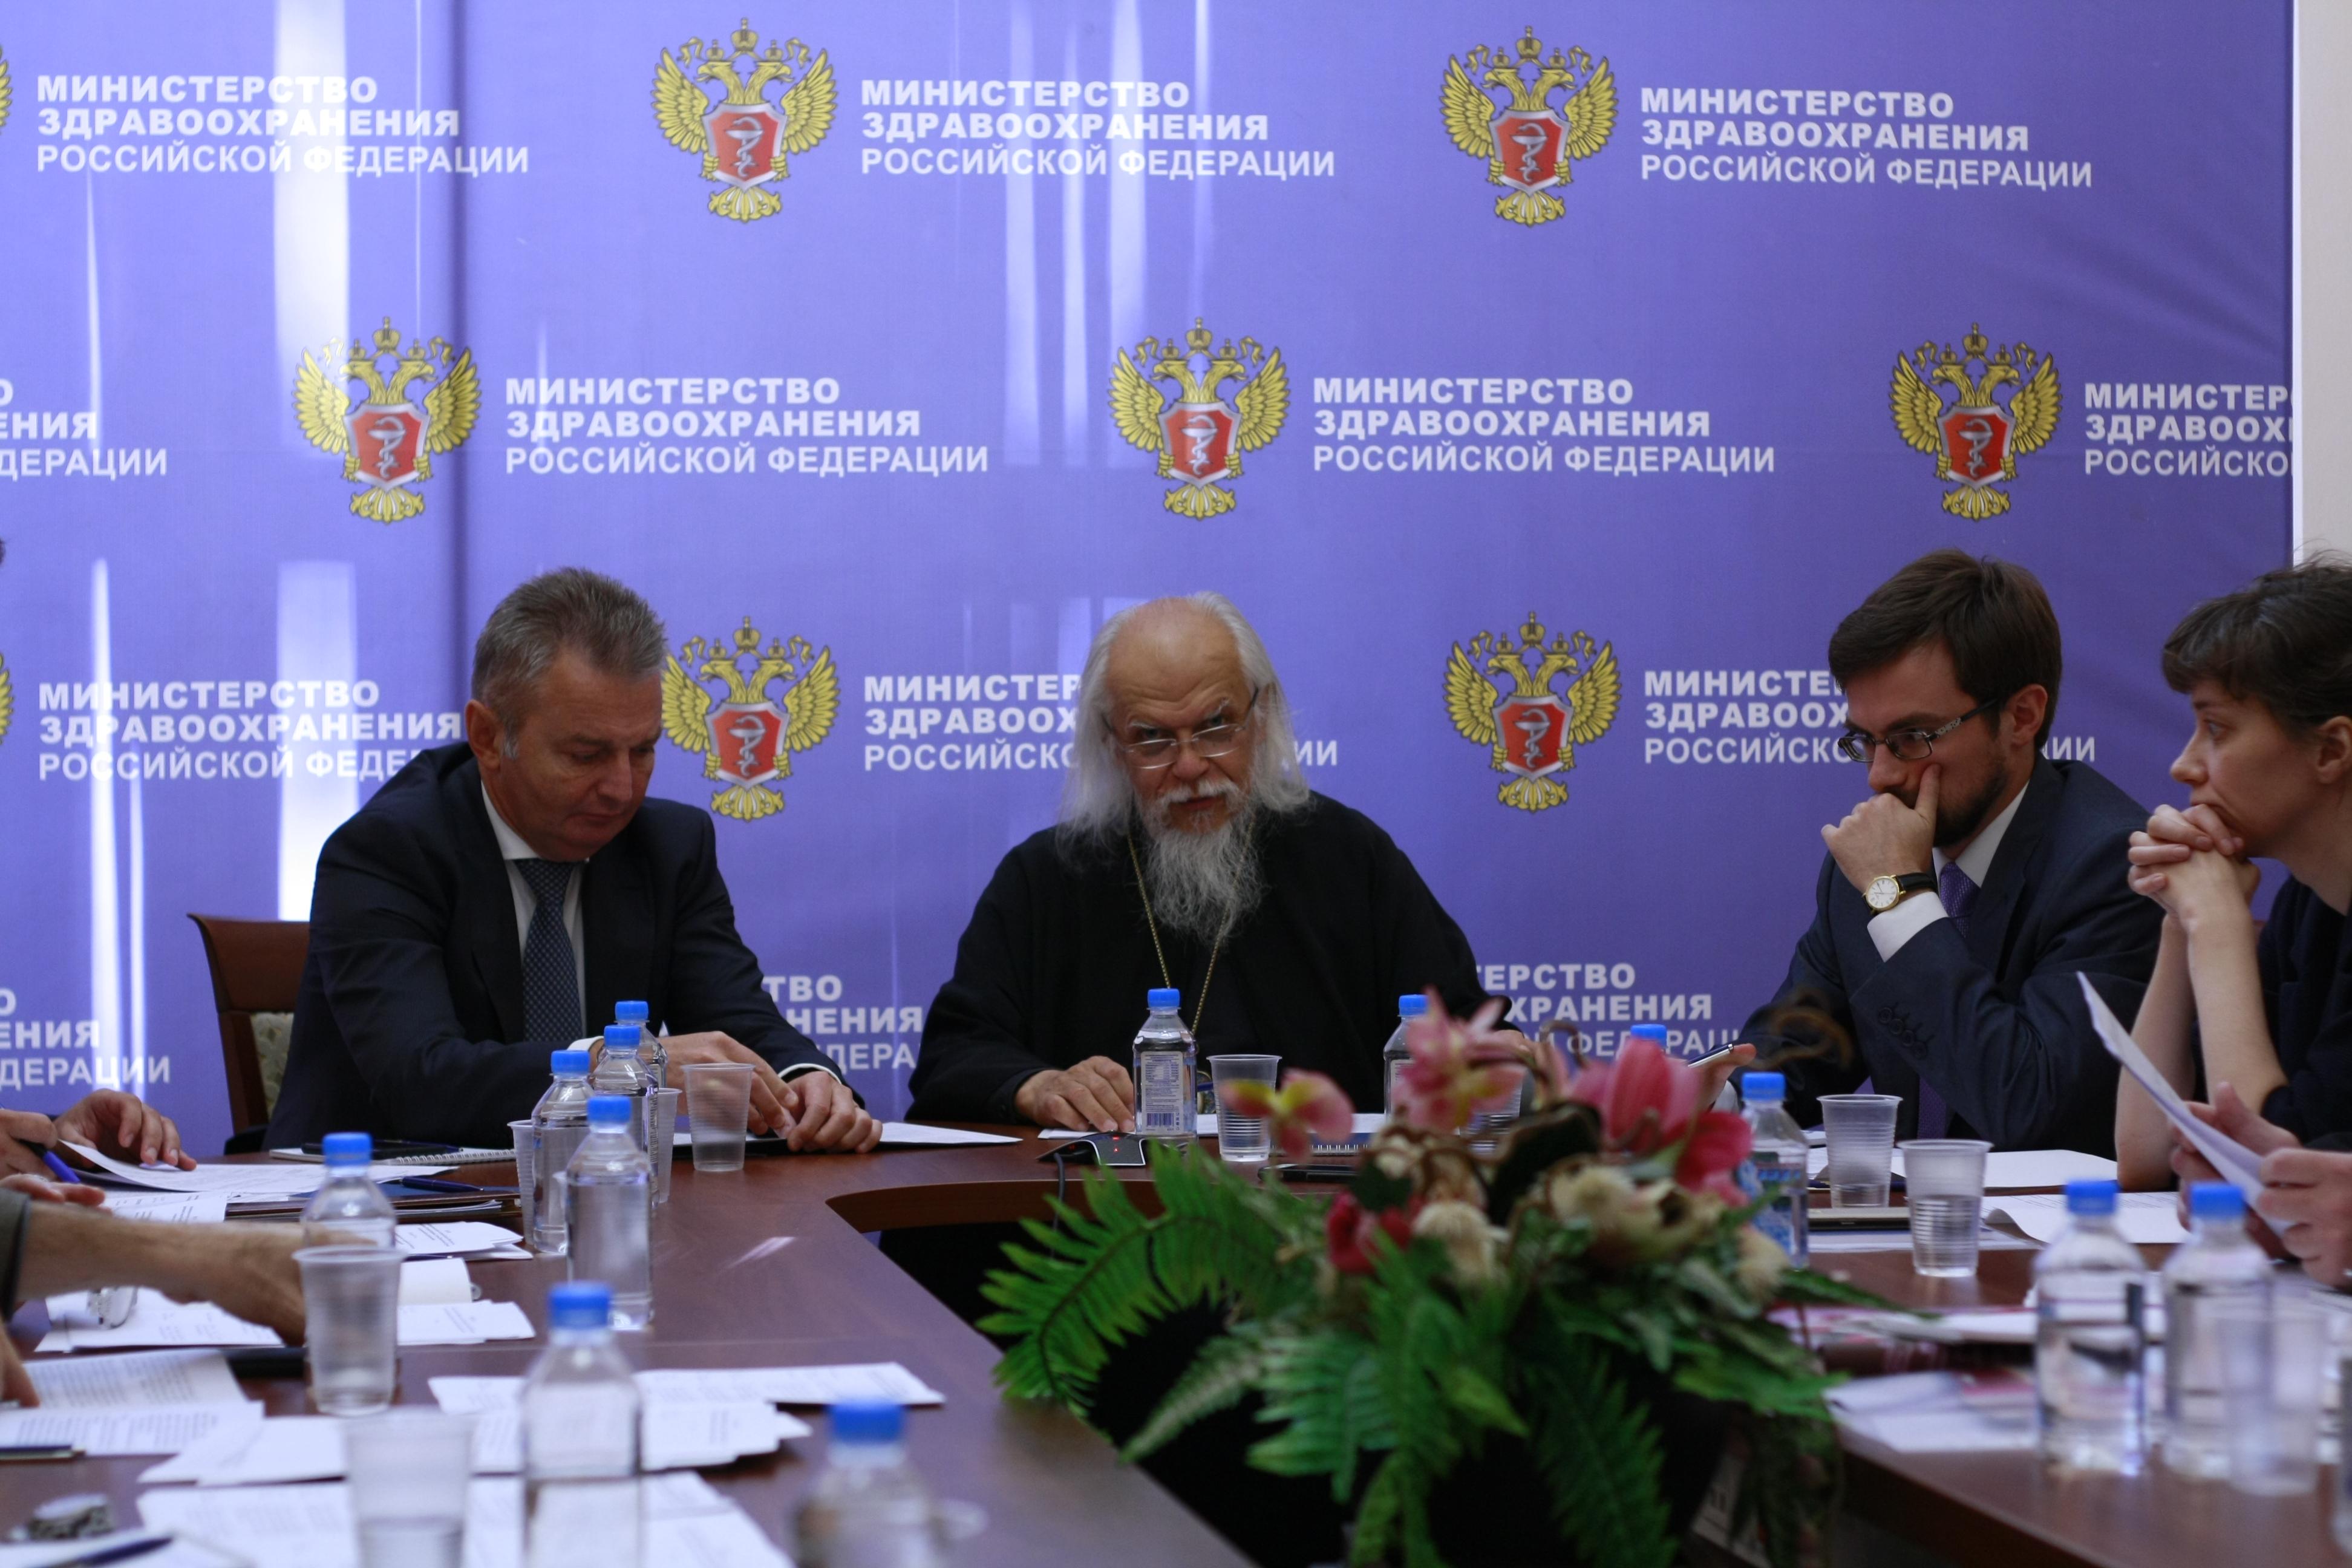 Фото пресс-службы Минздрава